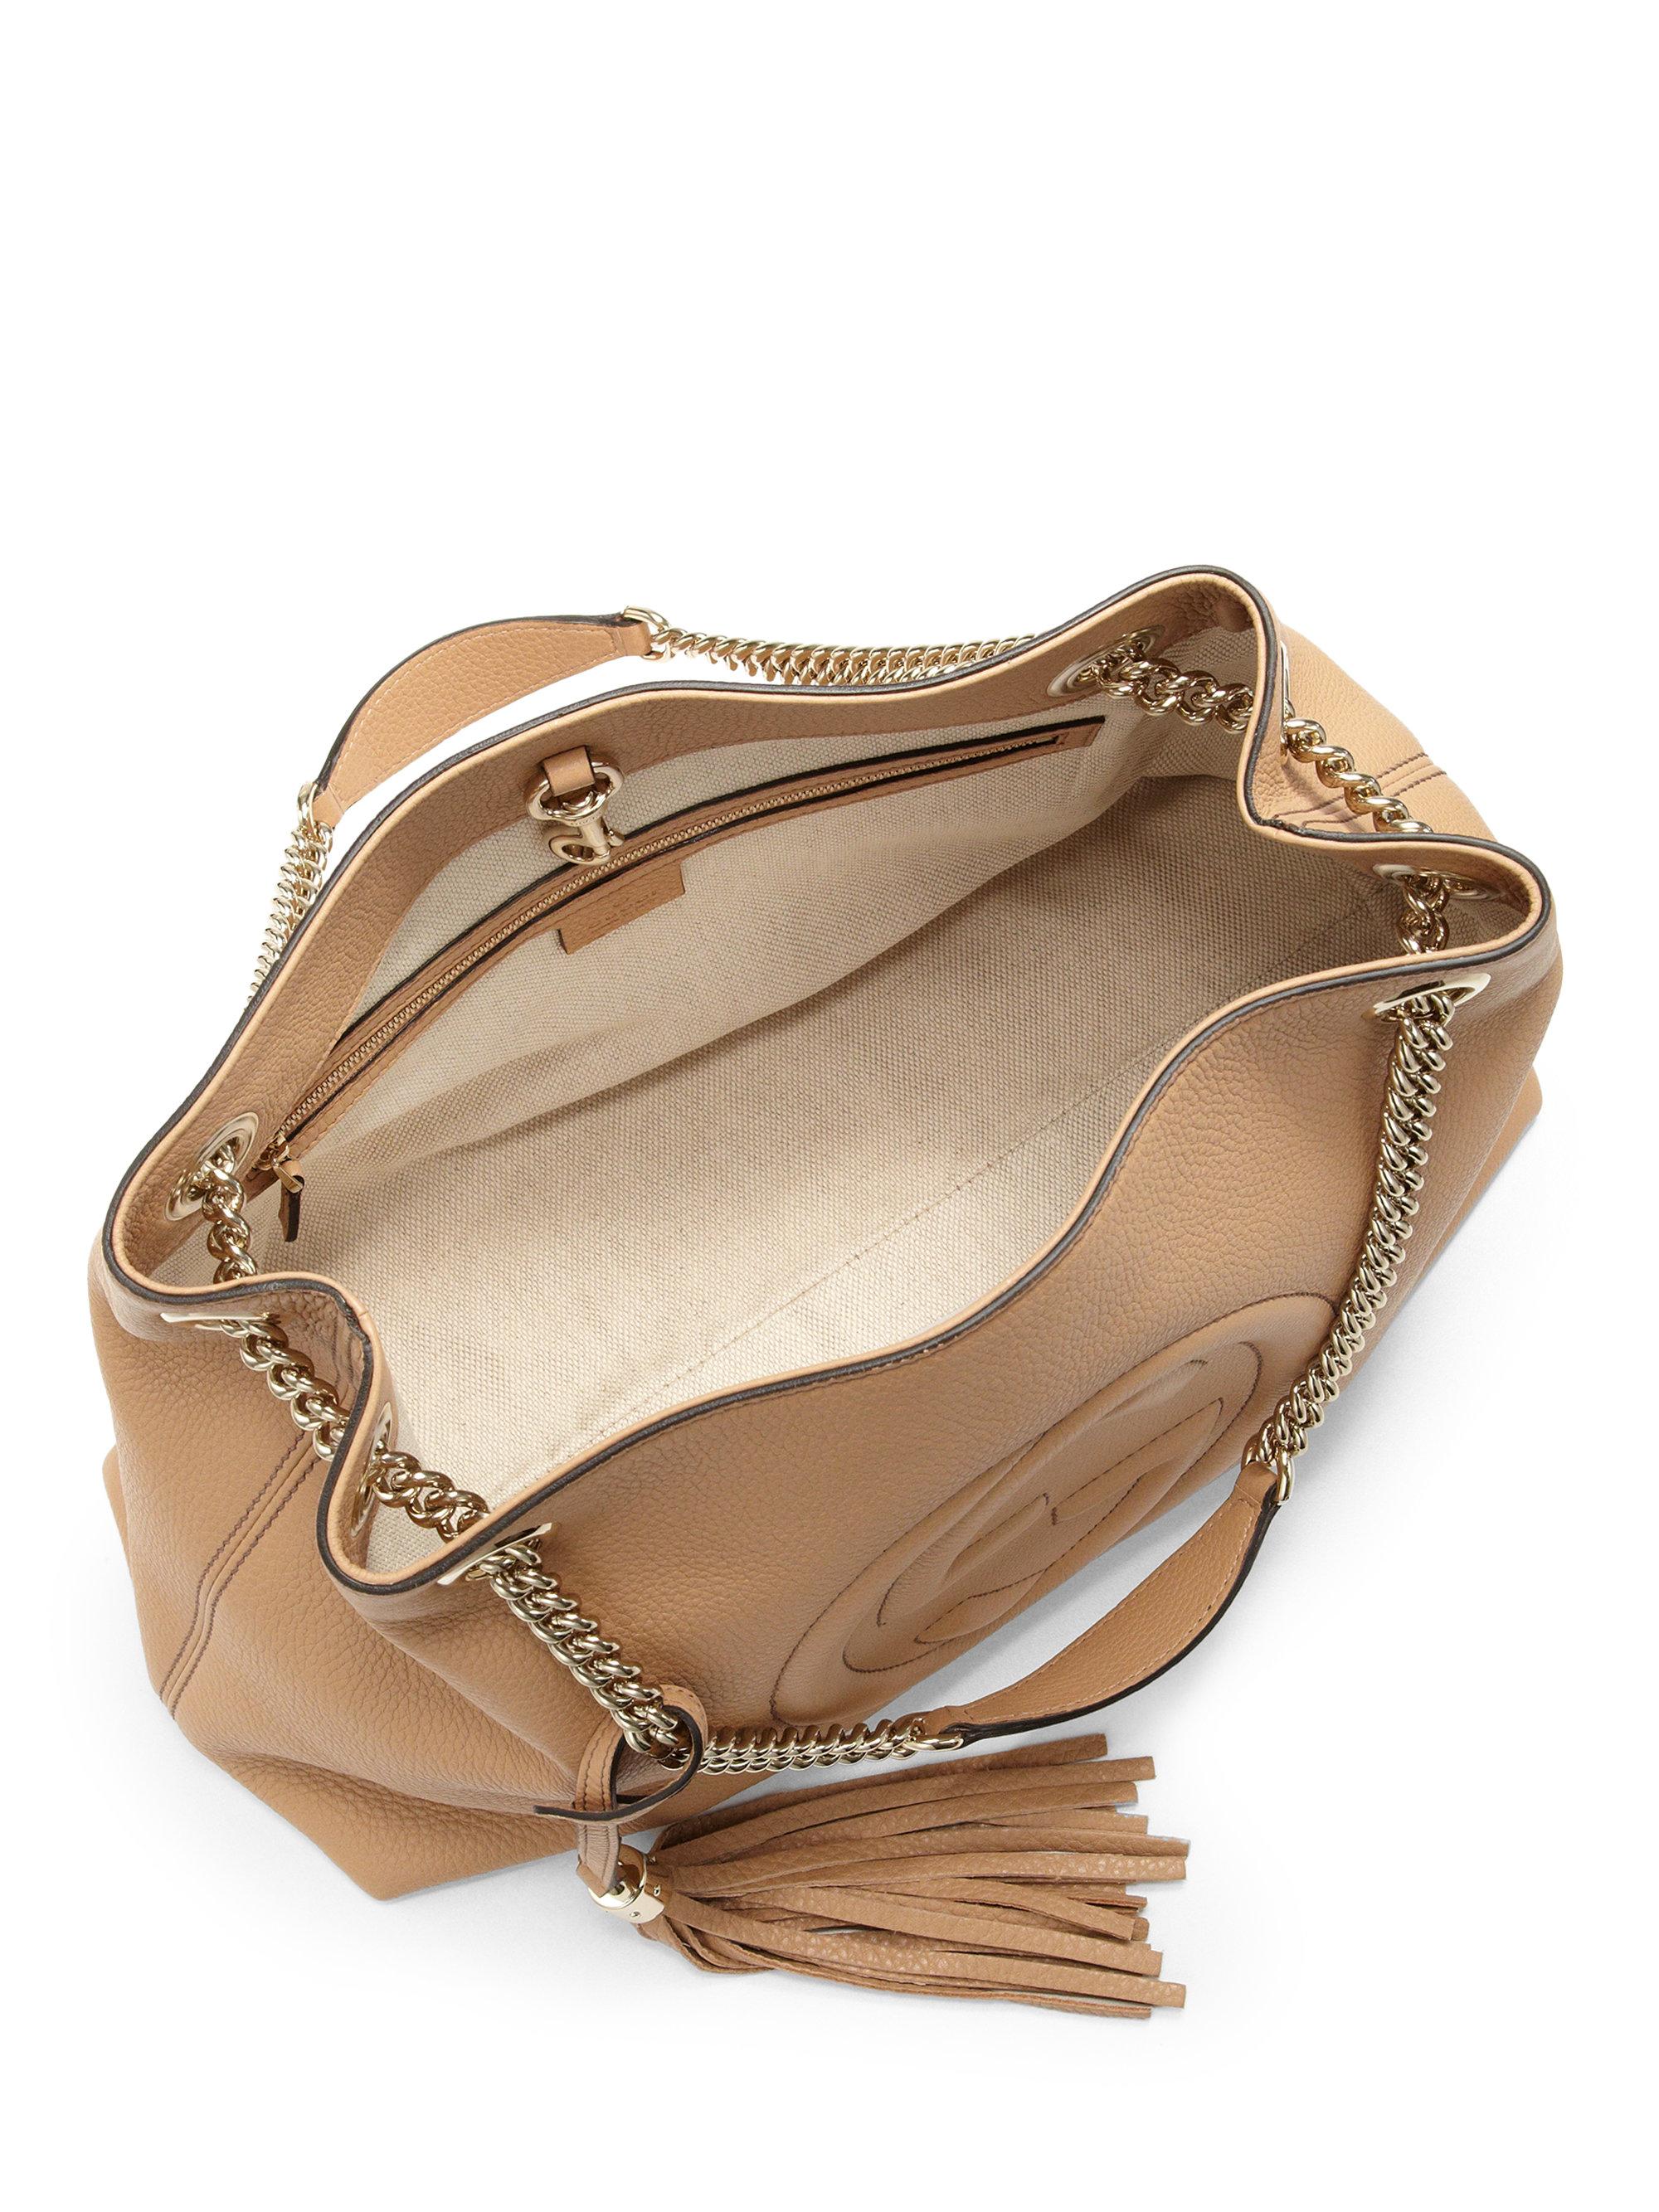 decc4f49baf0 Innovatenortheastflorida.com Lyst Gucci Soho Leather Shoulder Bag In ...